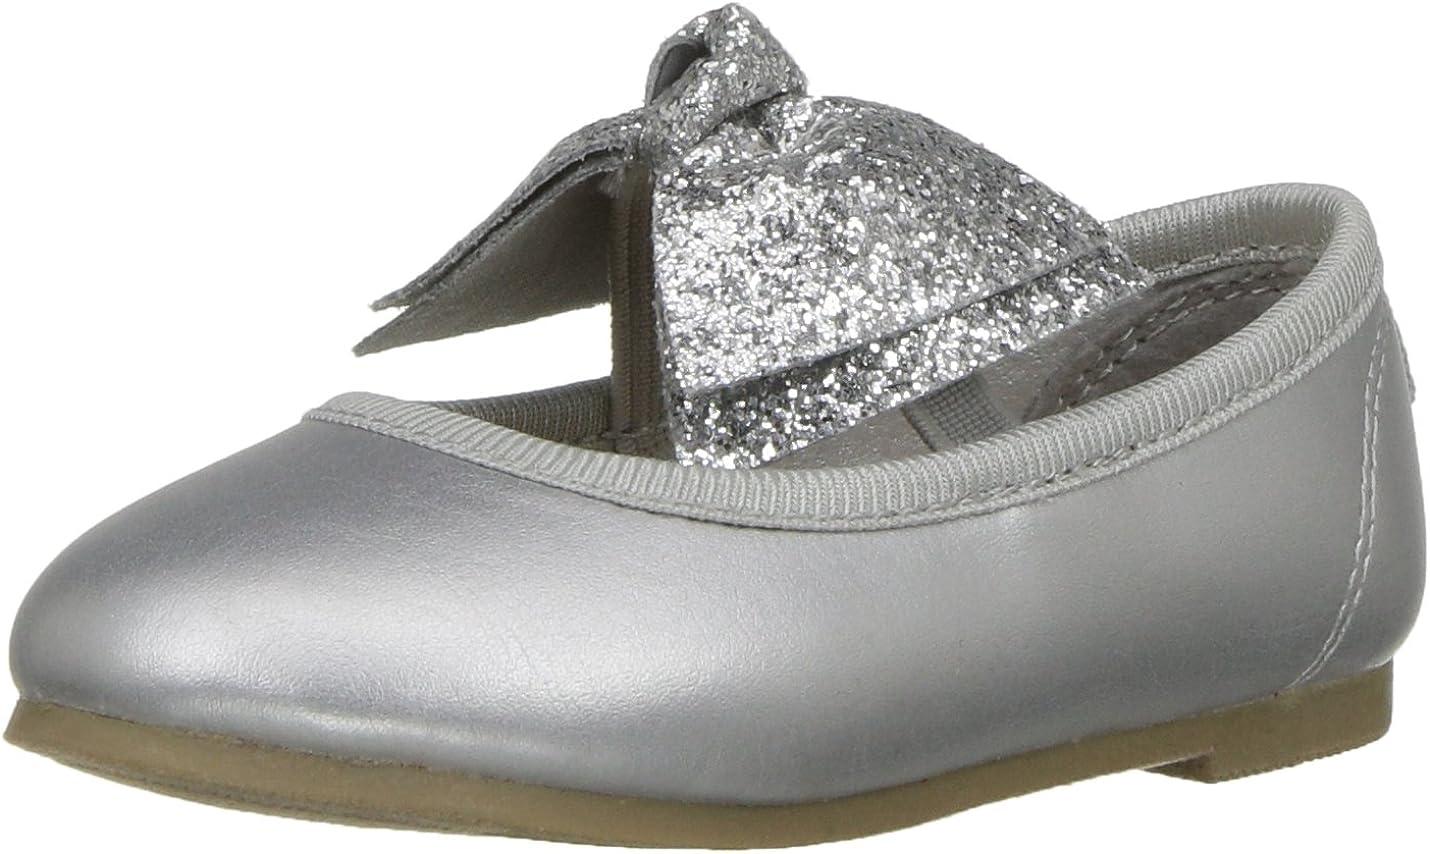 Carter's Max 90% 5 popular OFF Unisex-Child Anora Girl's Flat Ballet